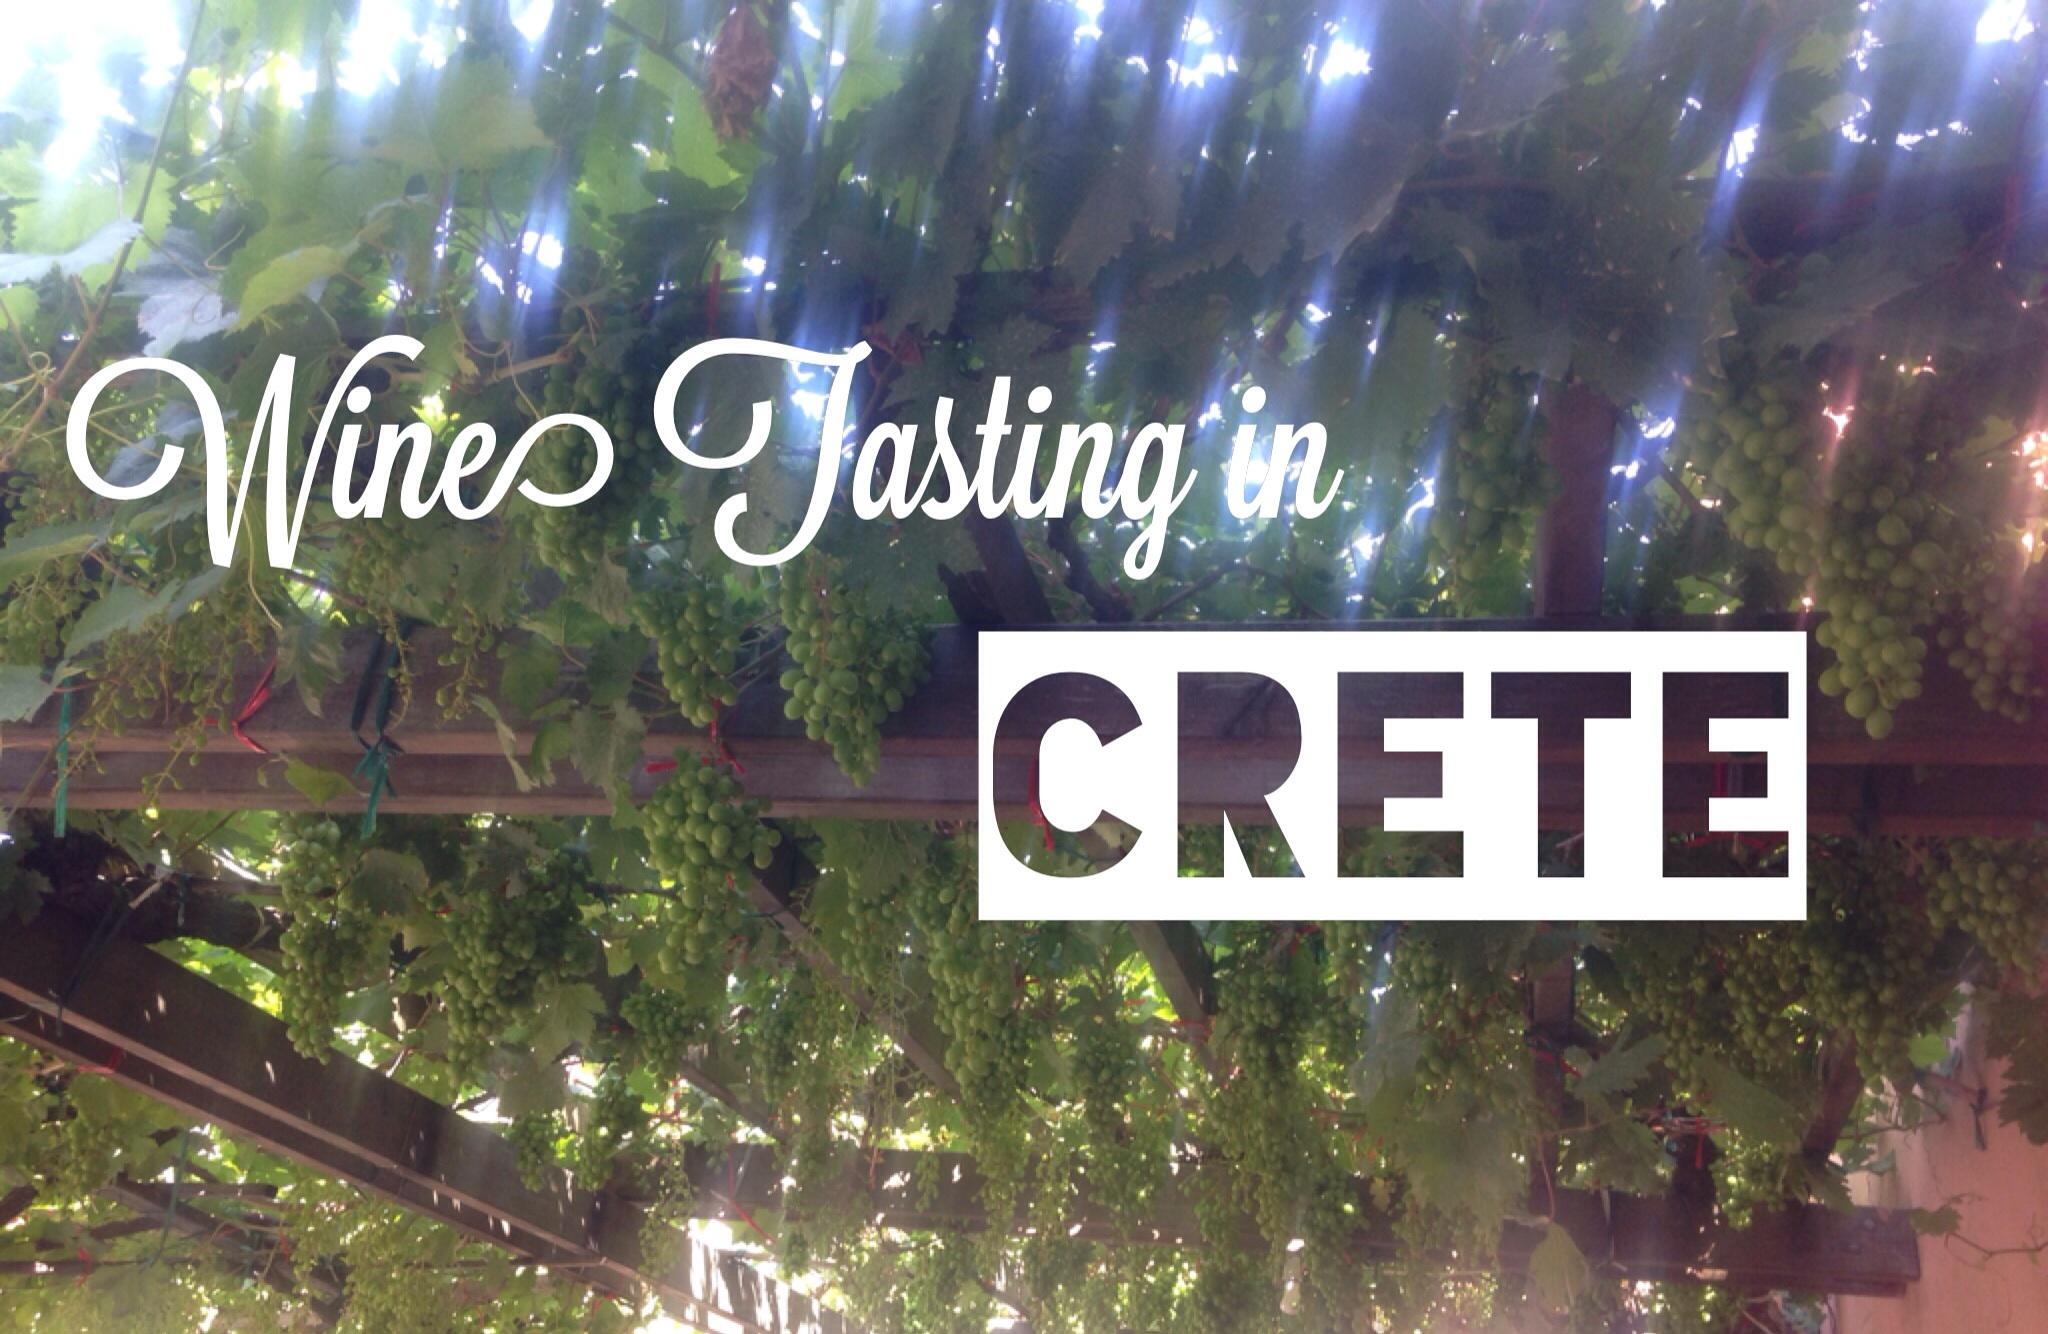 Wine Tasting in Crete, Greece